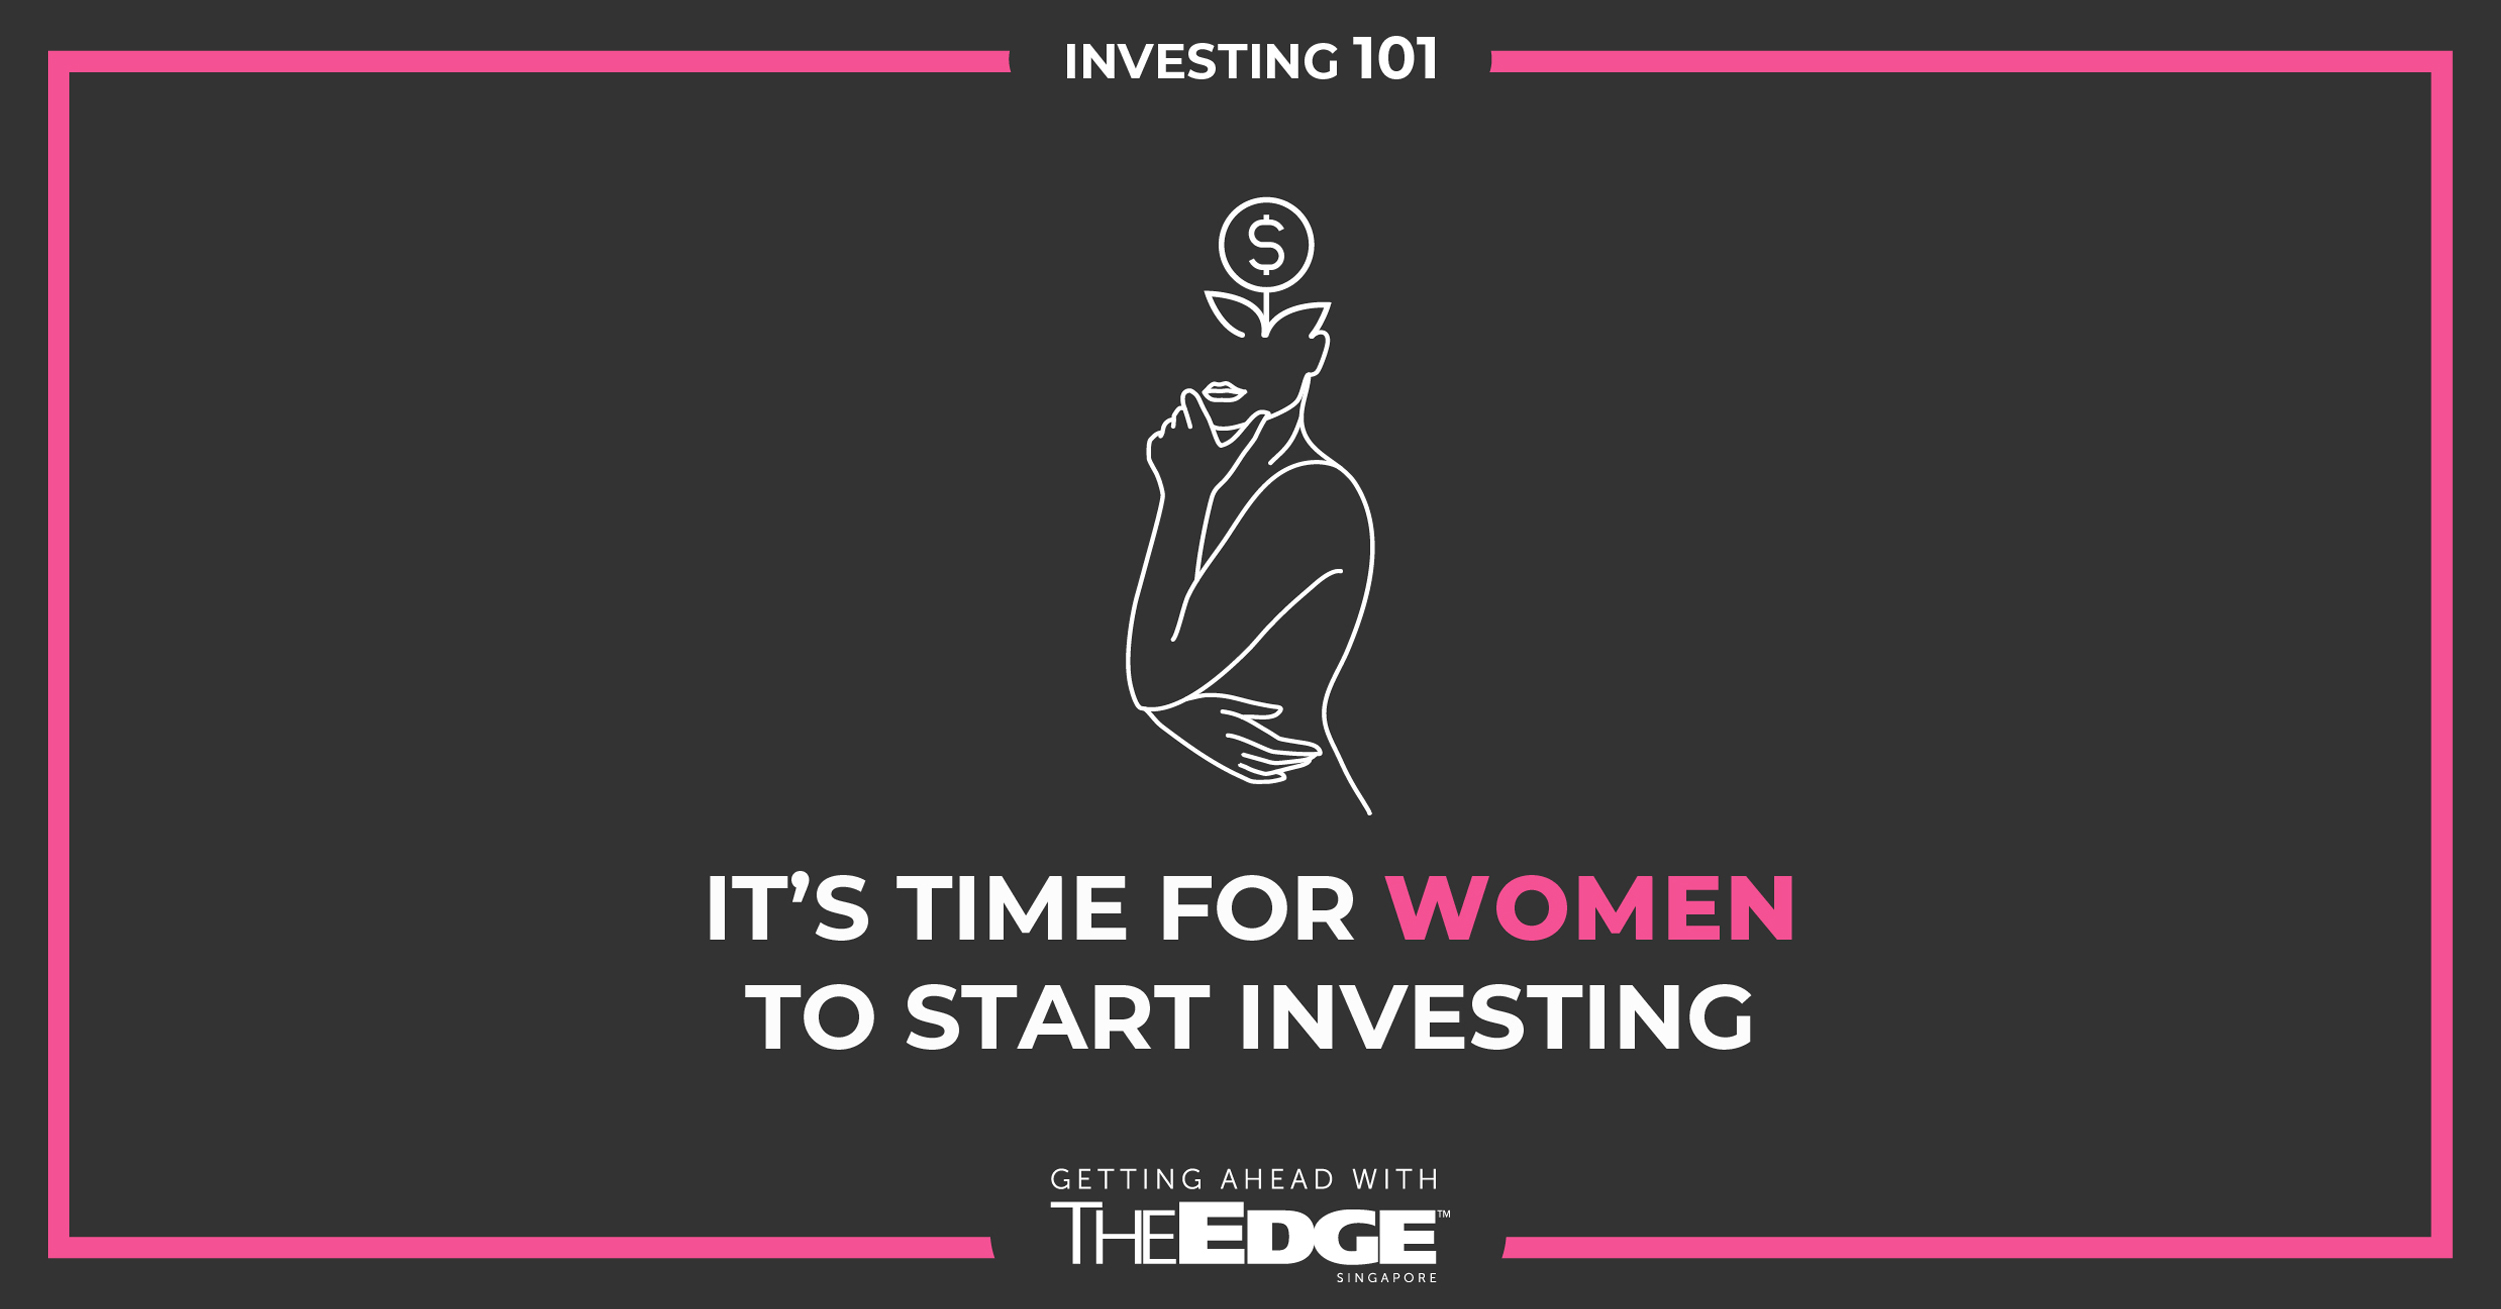 Women, it's time to start investing, says Saxo Markets - THE EDGE SINGAPORE